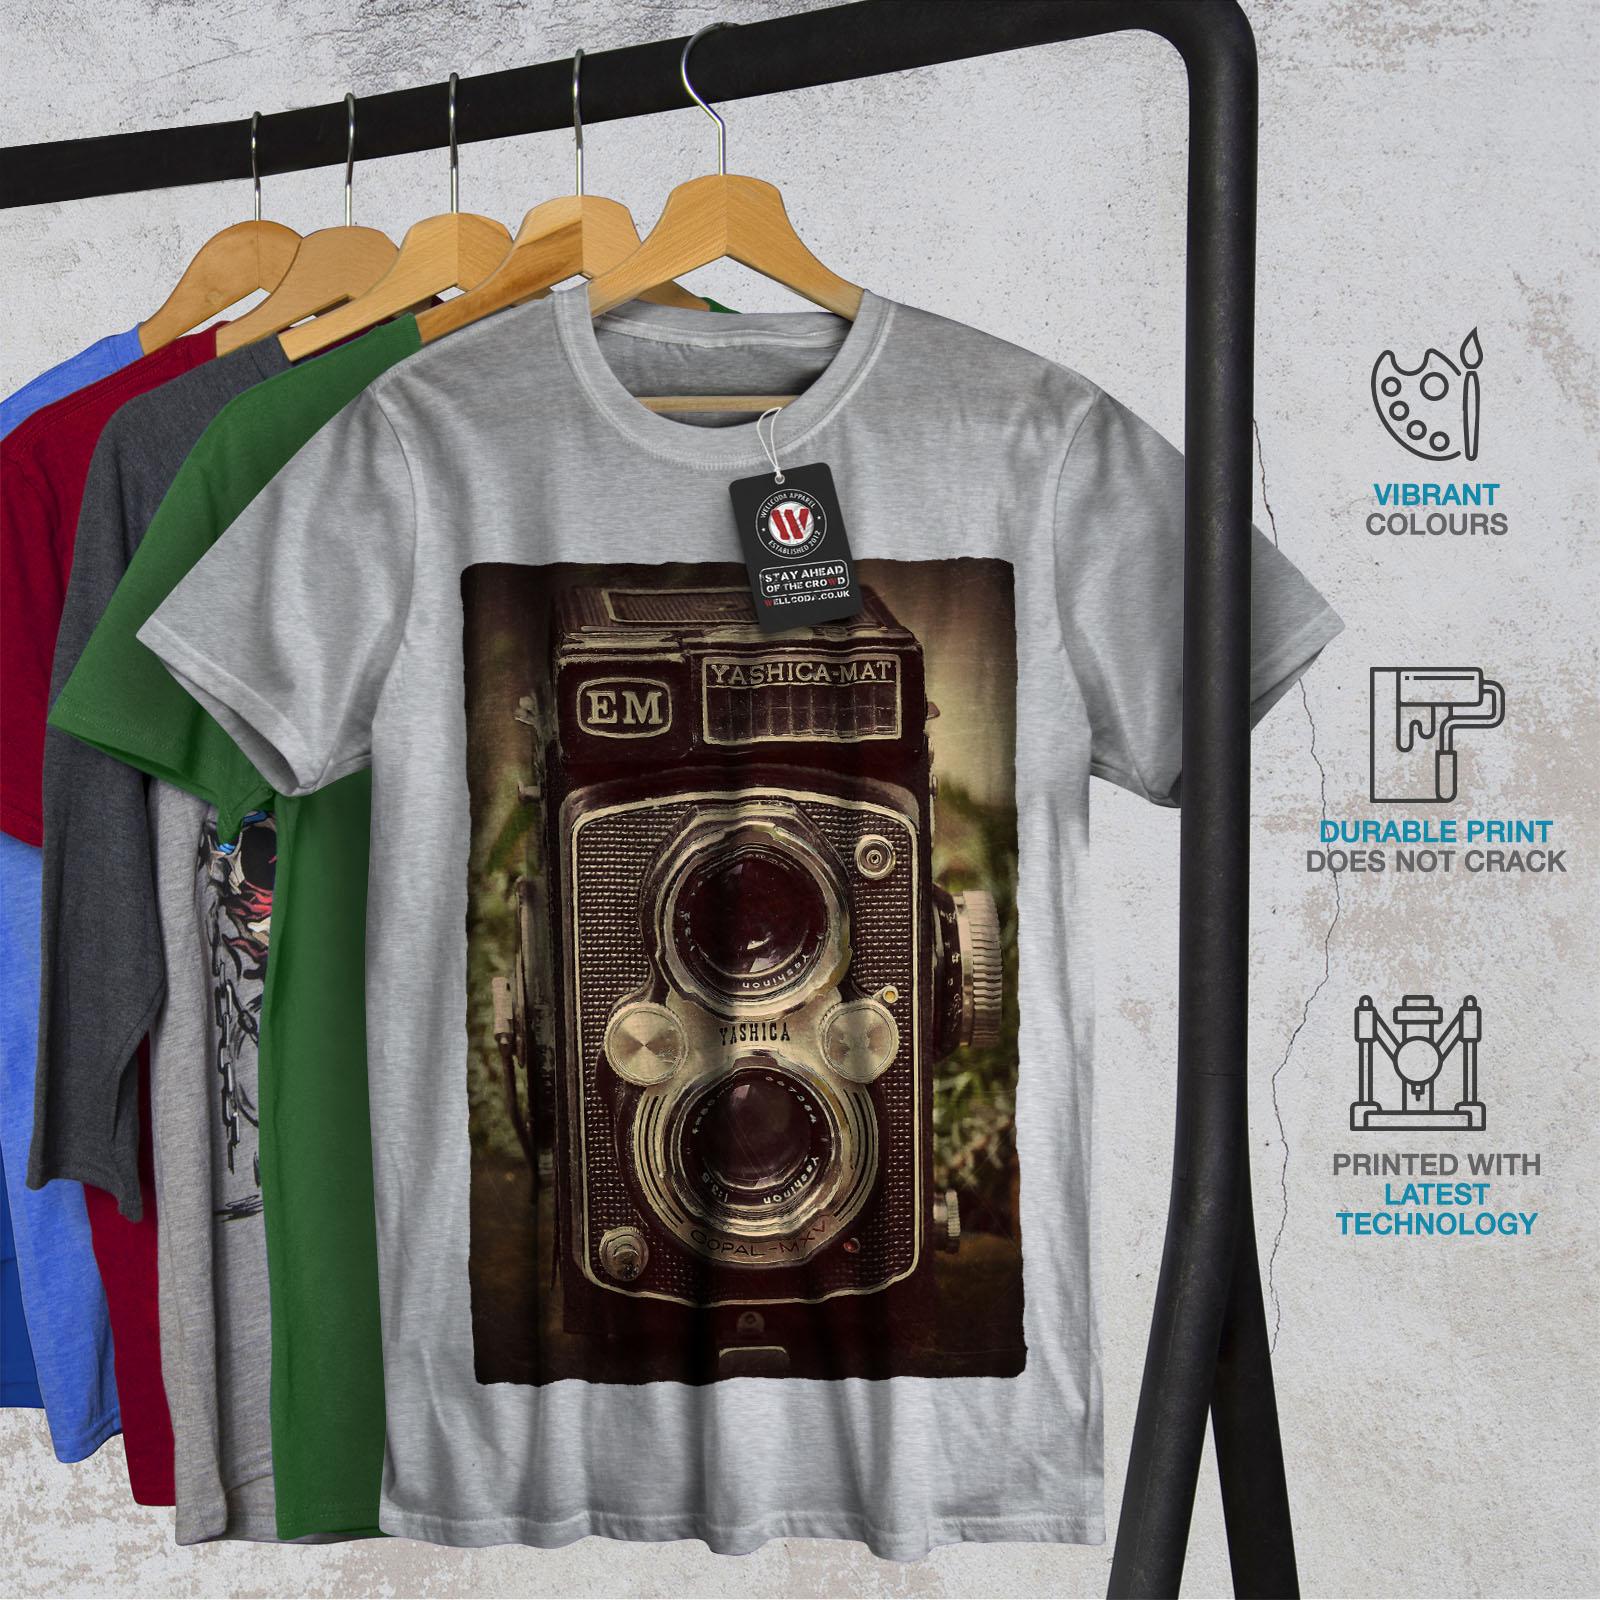 Wellcoda-Old-Foto-Camera-Mens-T-shirt-Retro-Graphic-Design-Printed-Tee thumbnail 18